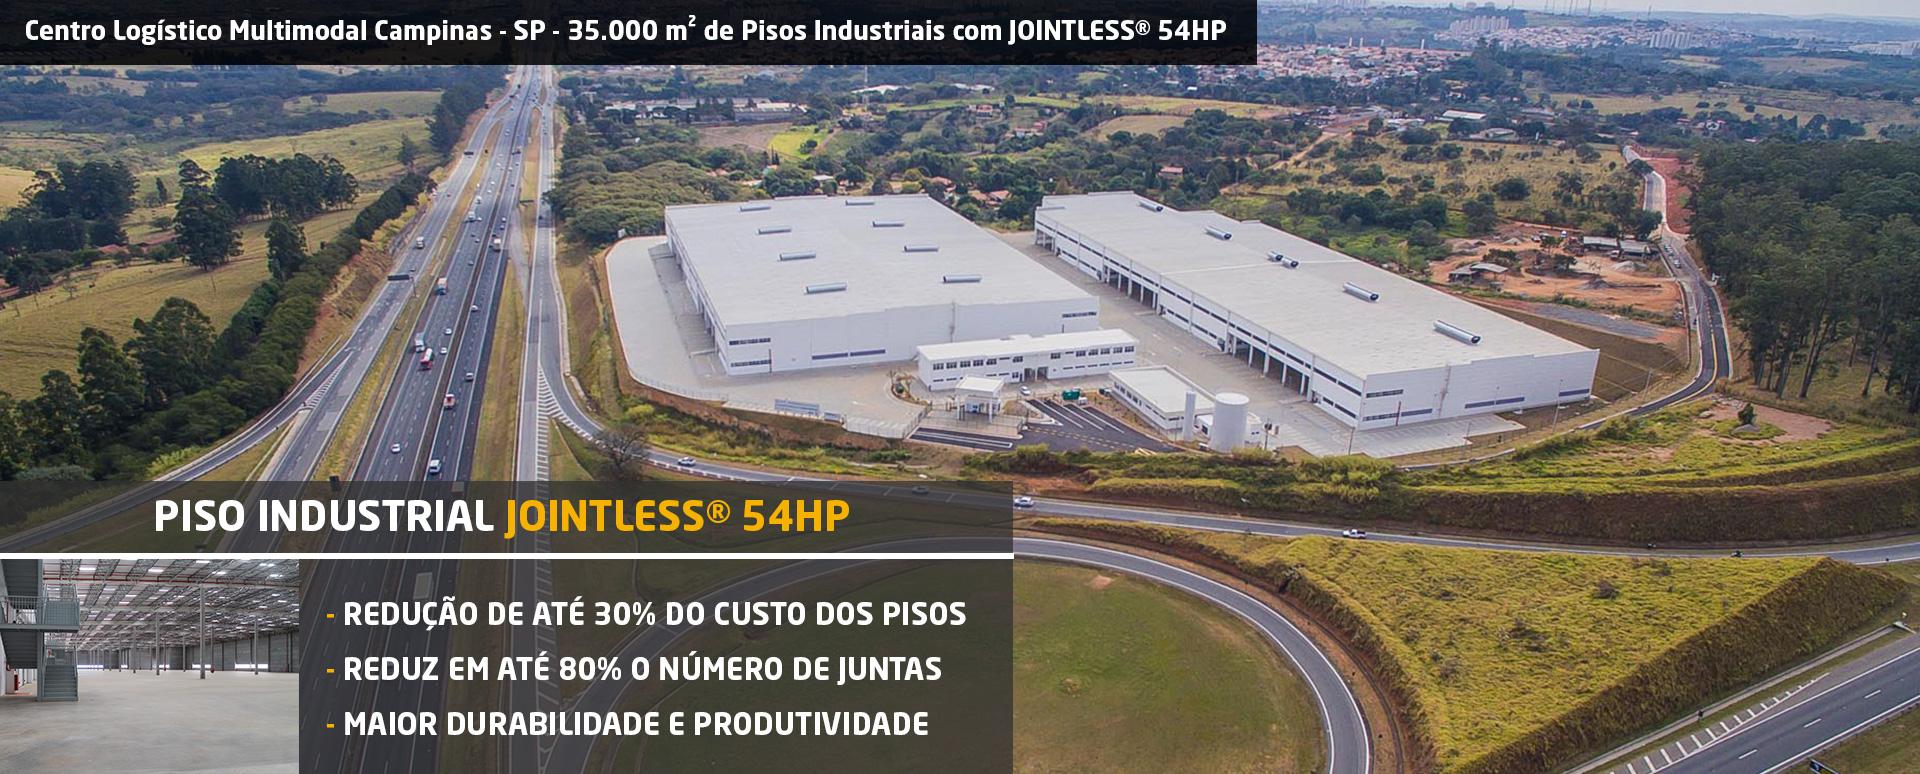 Piso Industrial Sem Juntas com JOINTLESS 54 HP